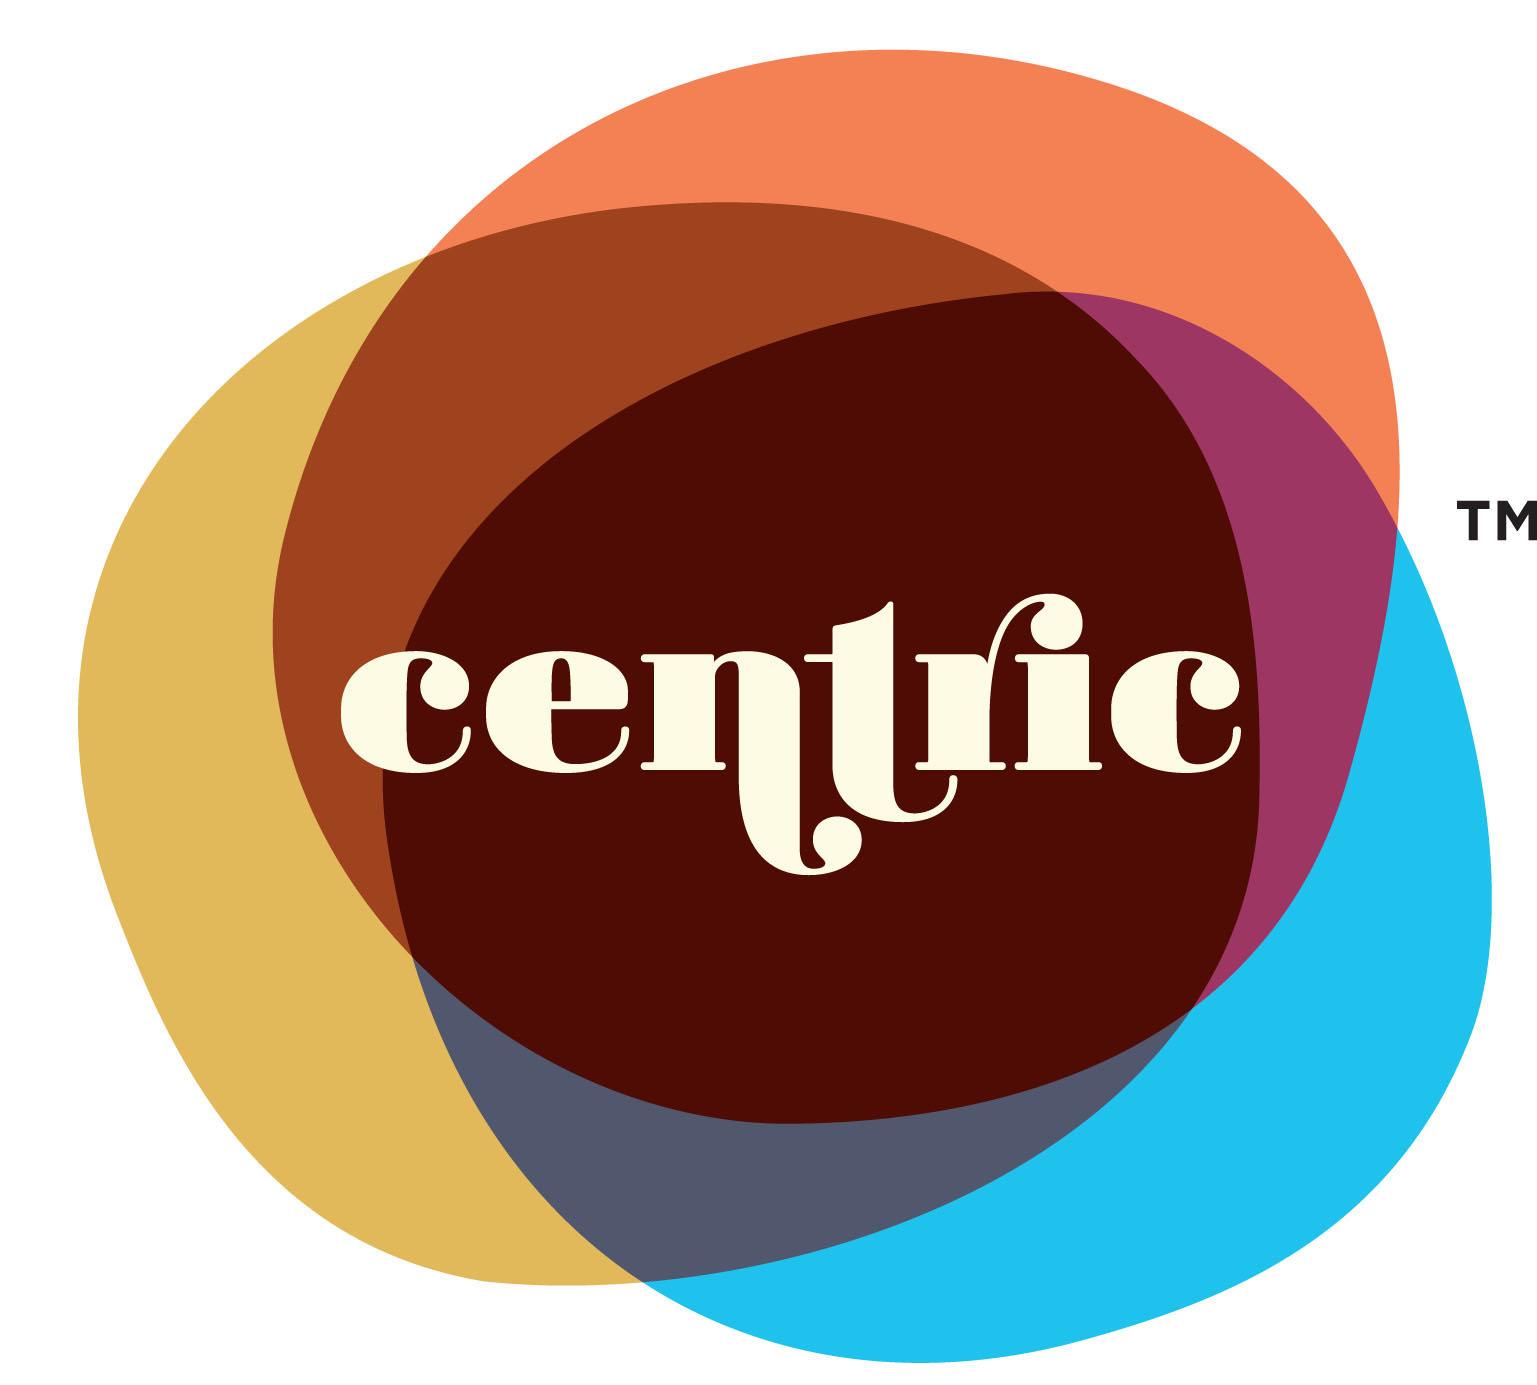 Centric_logo.jpg